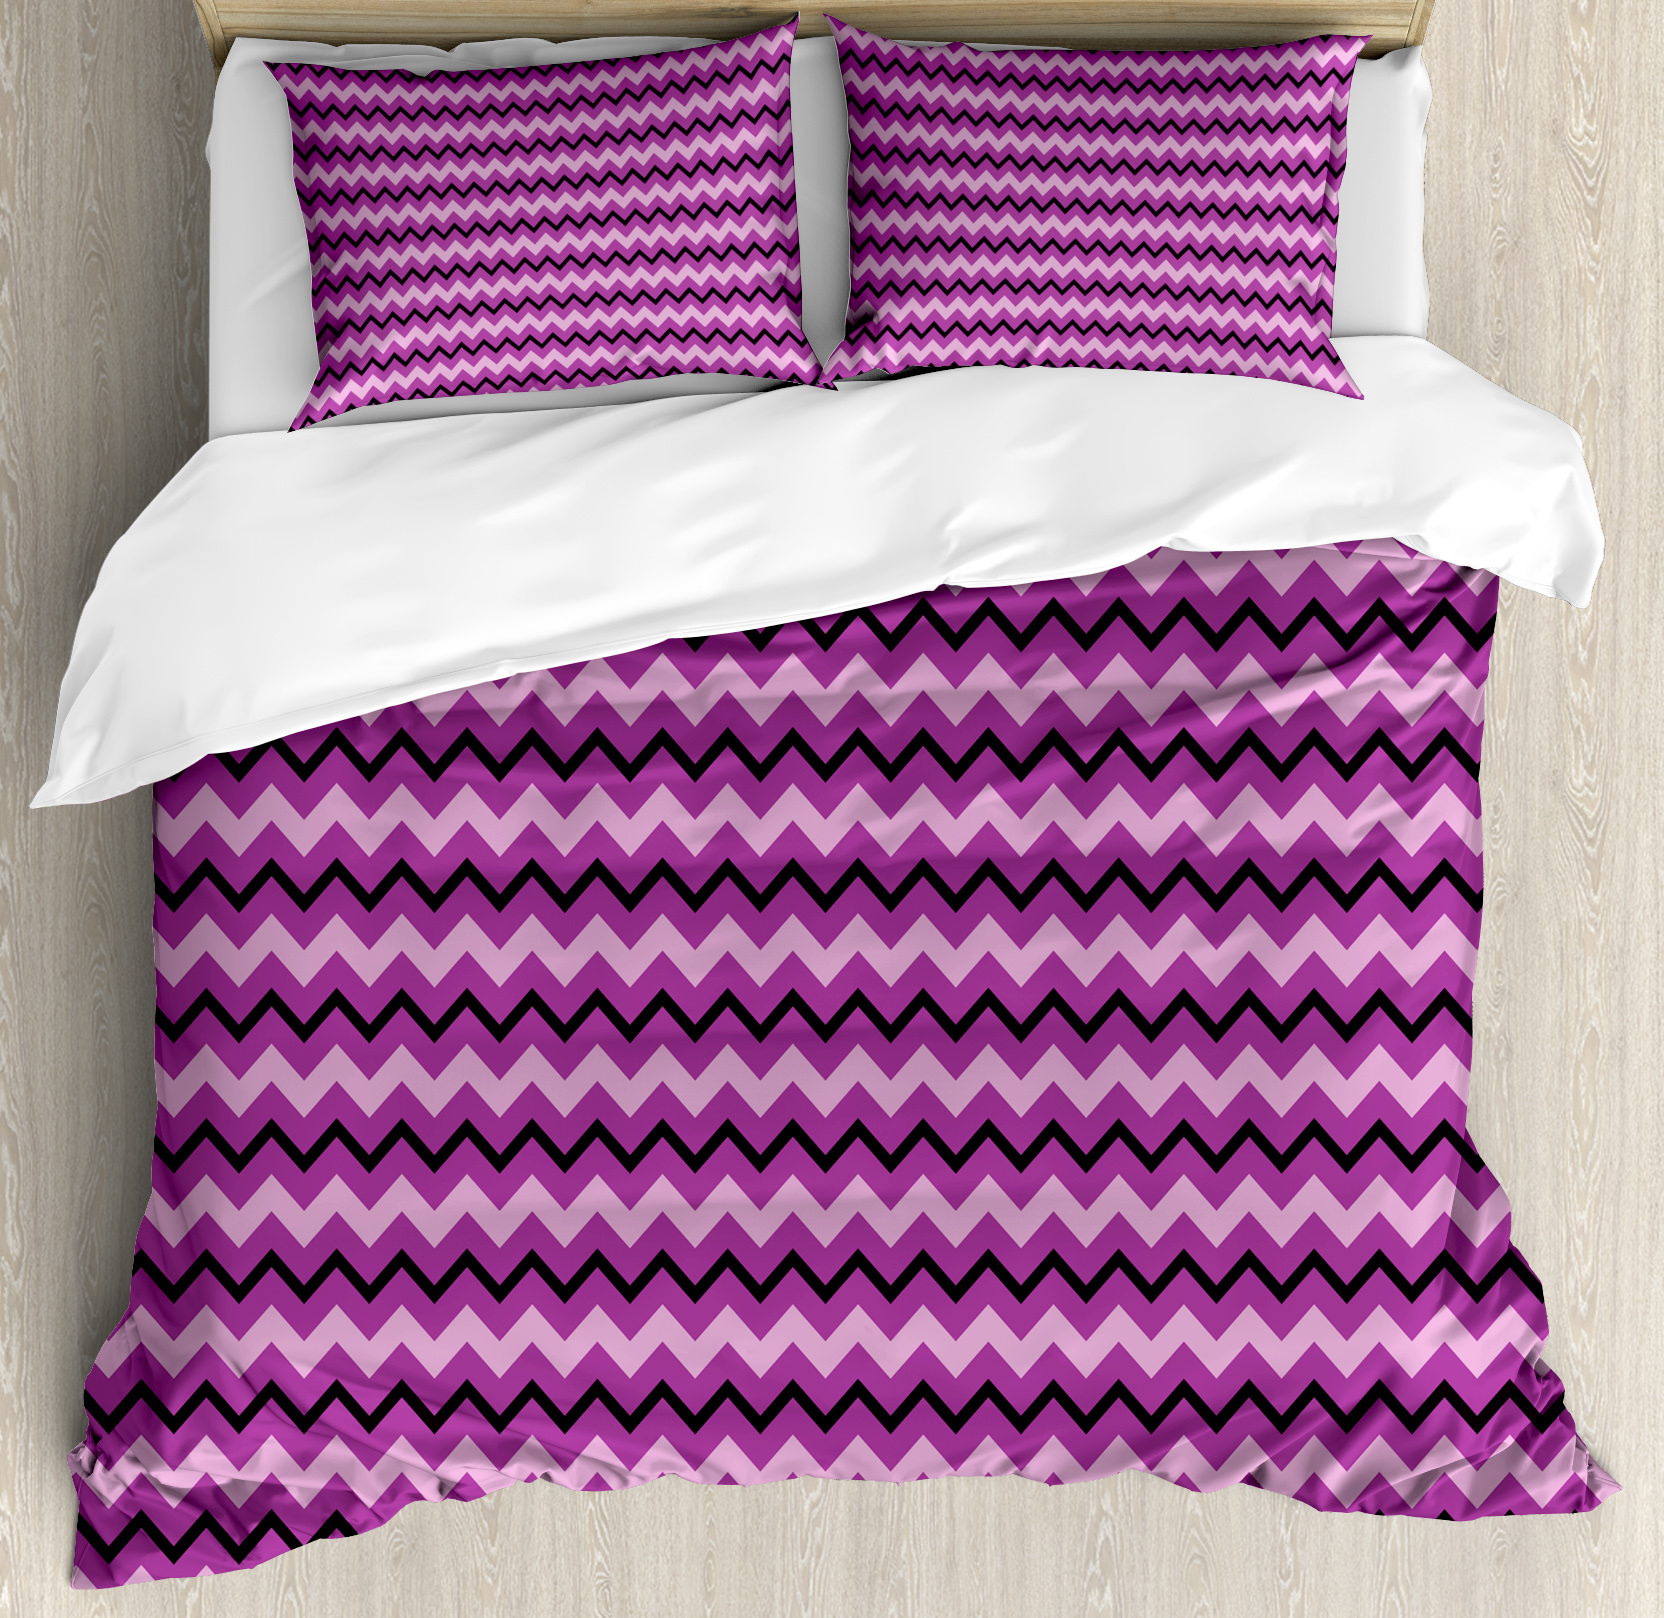 Teen Room Decor Queen Size Duvet Cover Set, Zigzag Backgr...